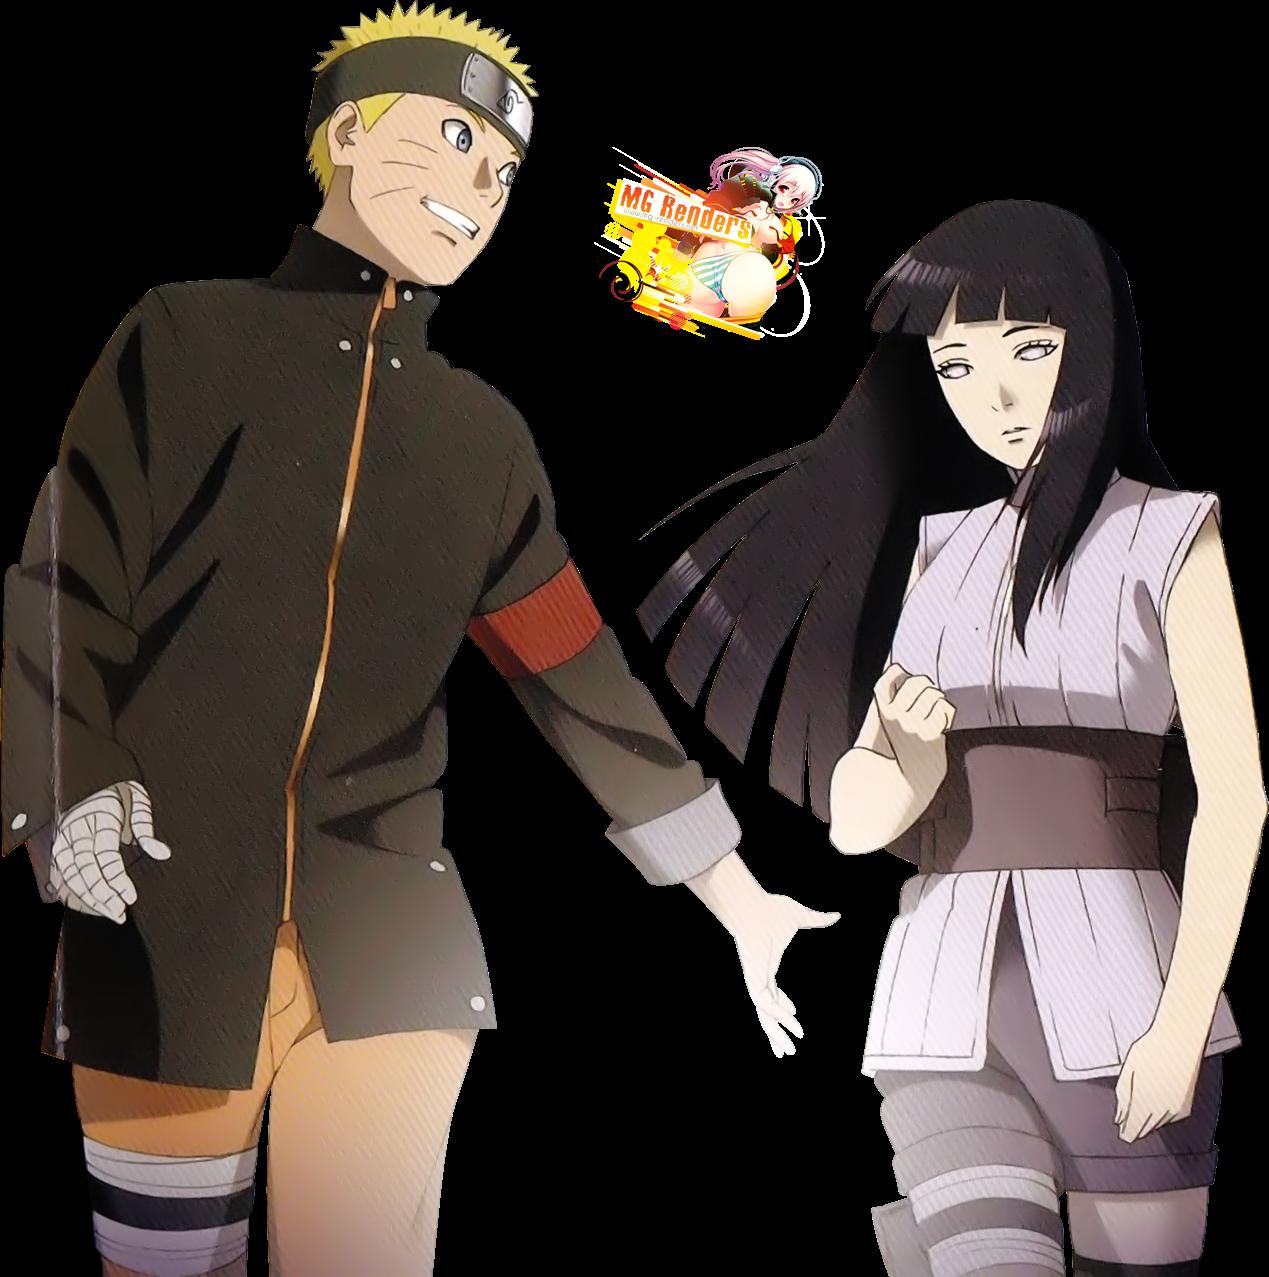 Tags: Anime, Render,  Hyuuga Hinata,  Naruto,  Uzumaki Naruto, PNG, Image, Picture